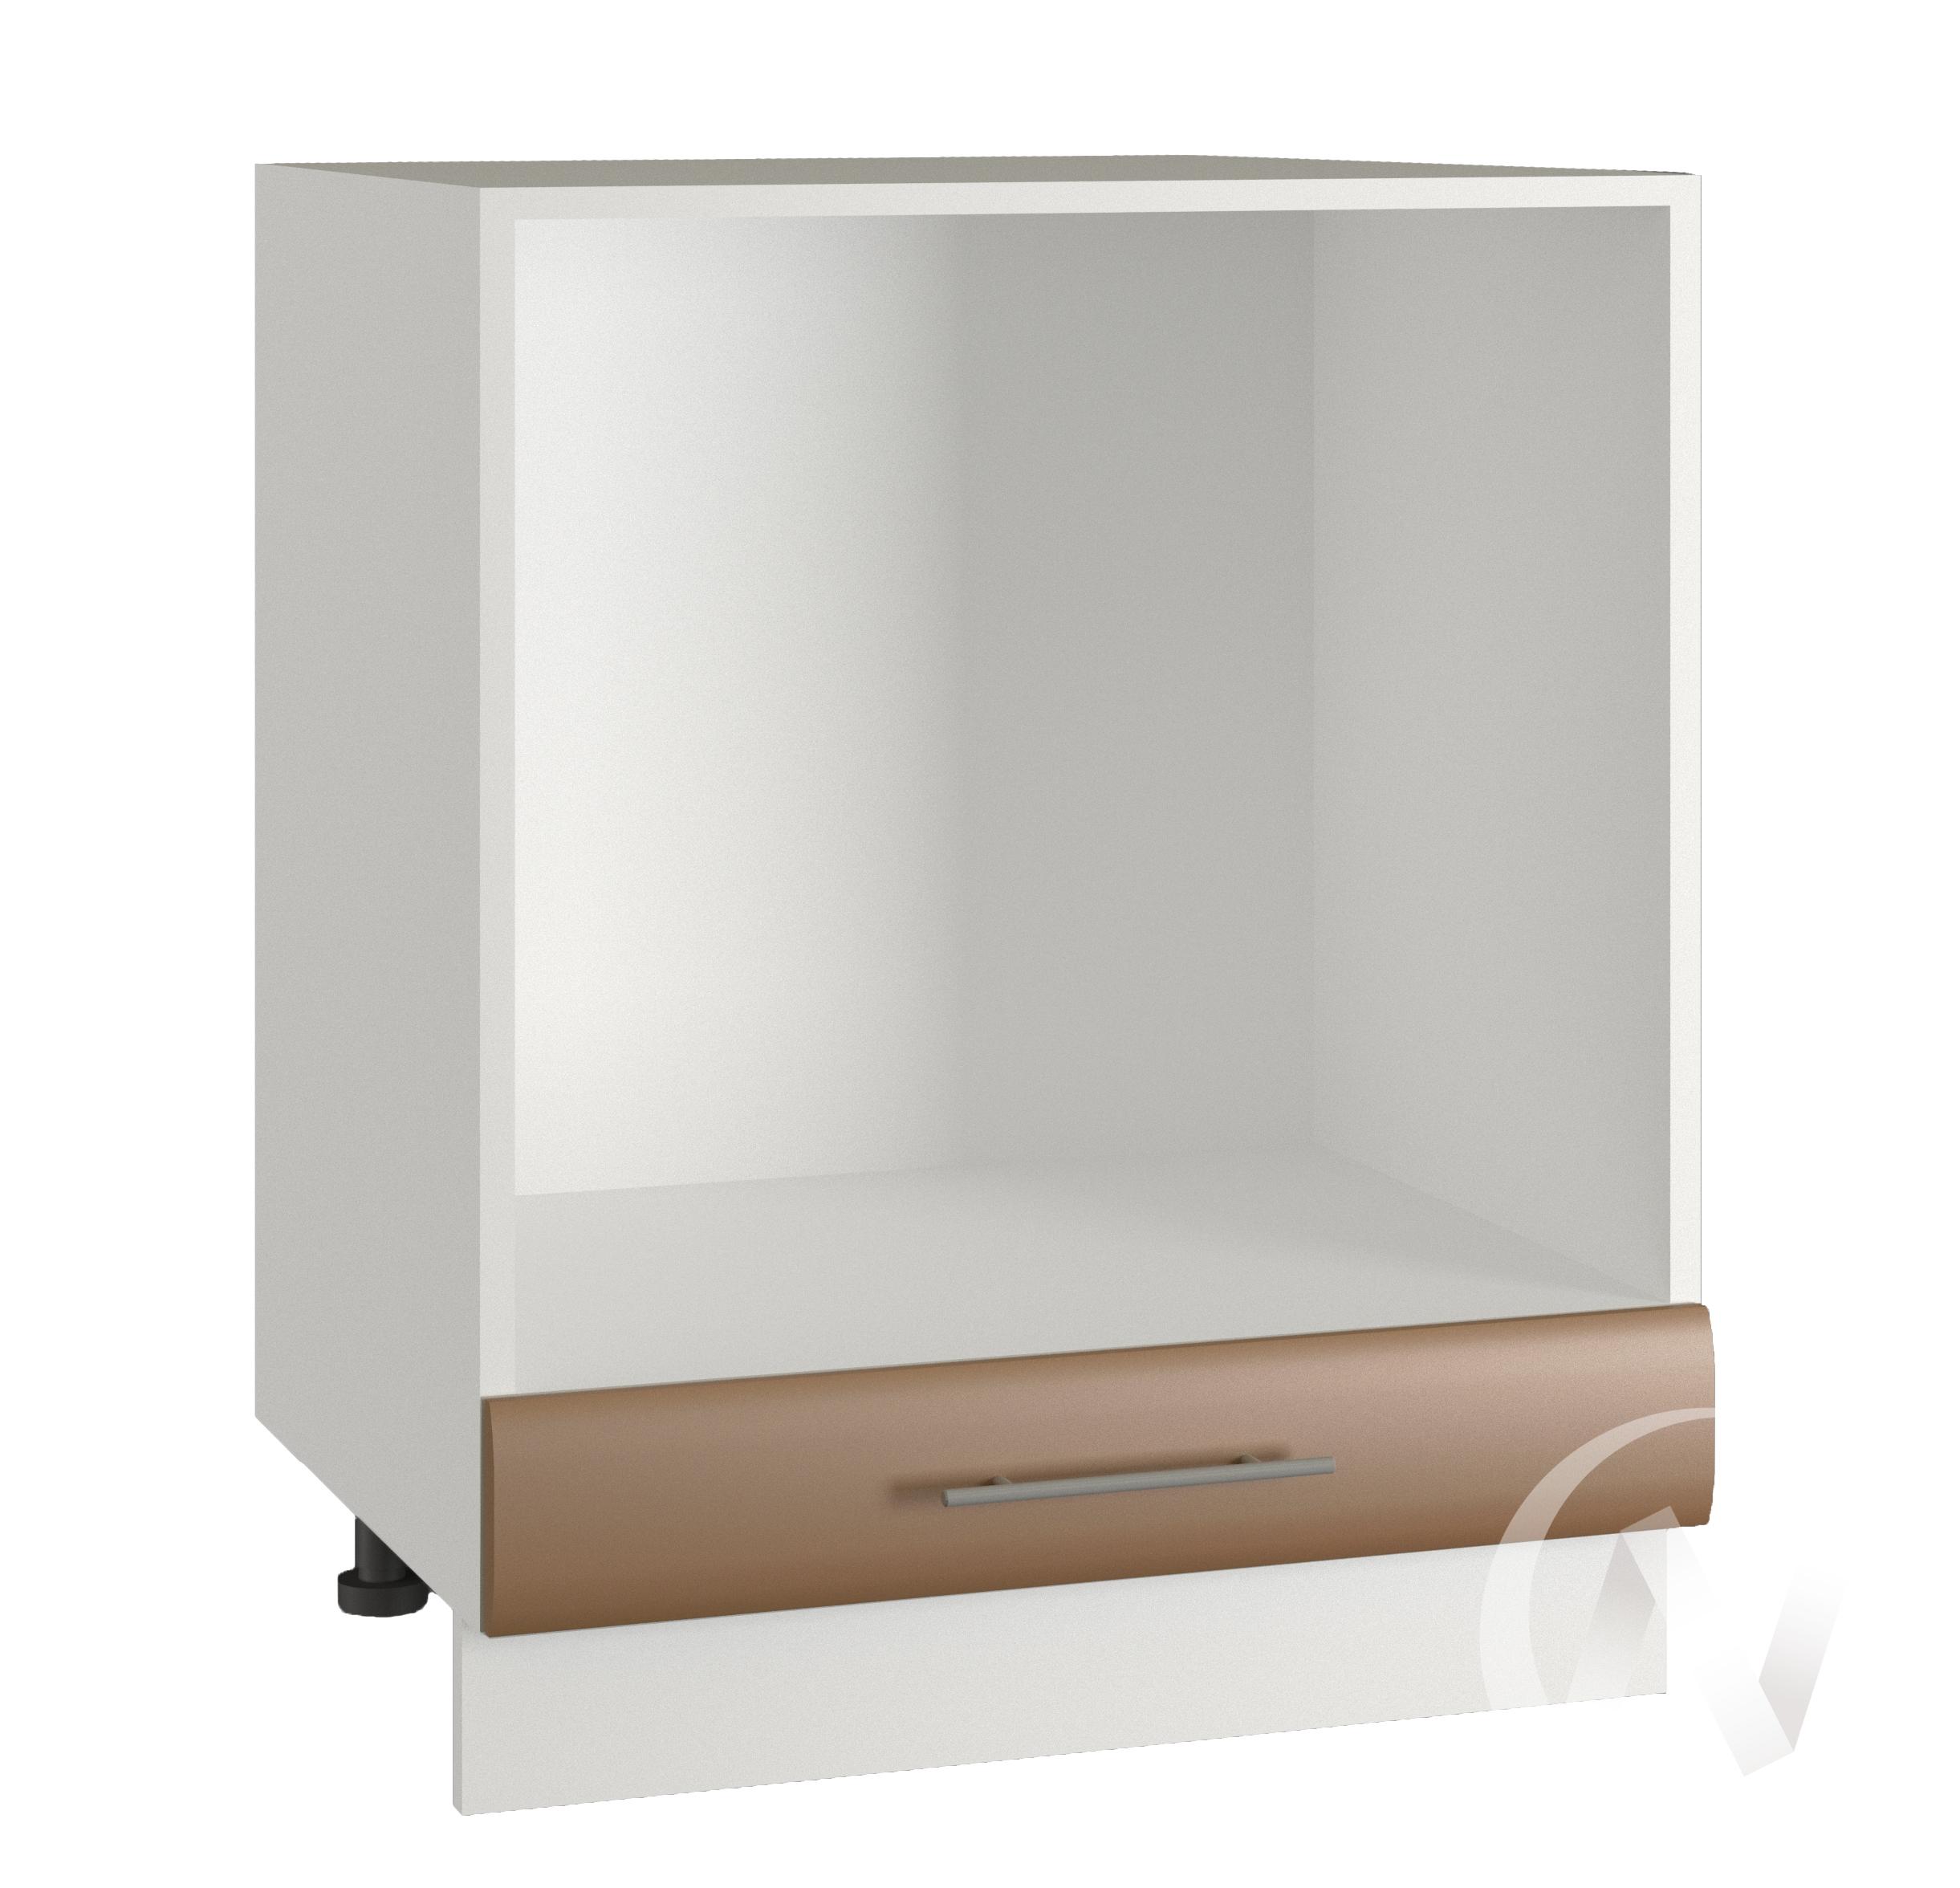 "Кухня ""Люкс"": Шкаф нижний под духовку 600, ШНД 600 (Шоколад матовый/корпус белый)"